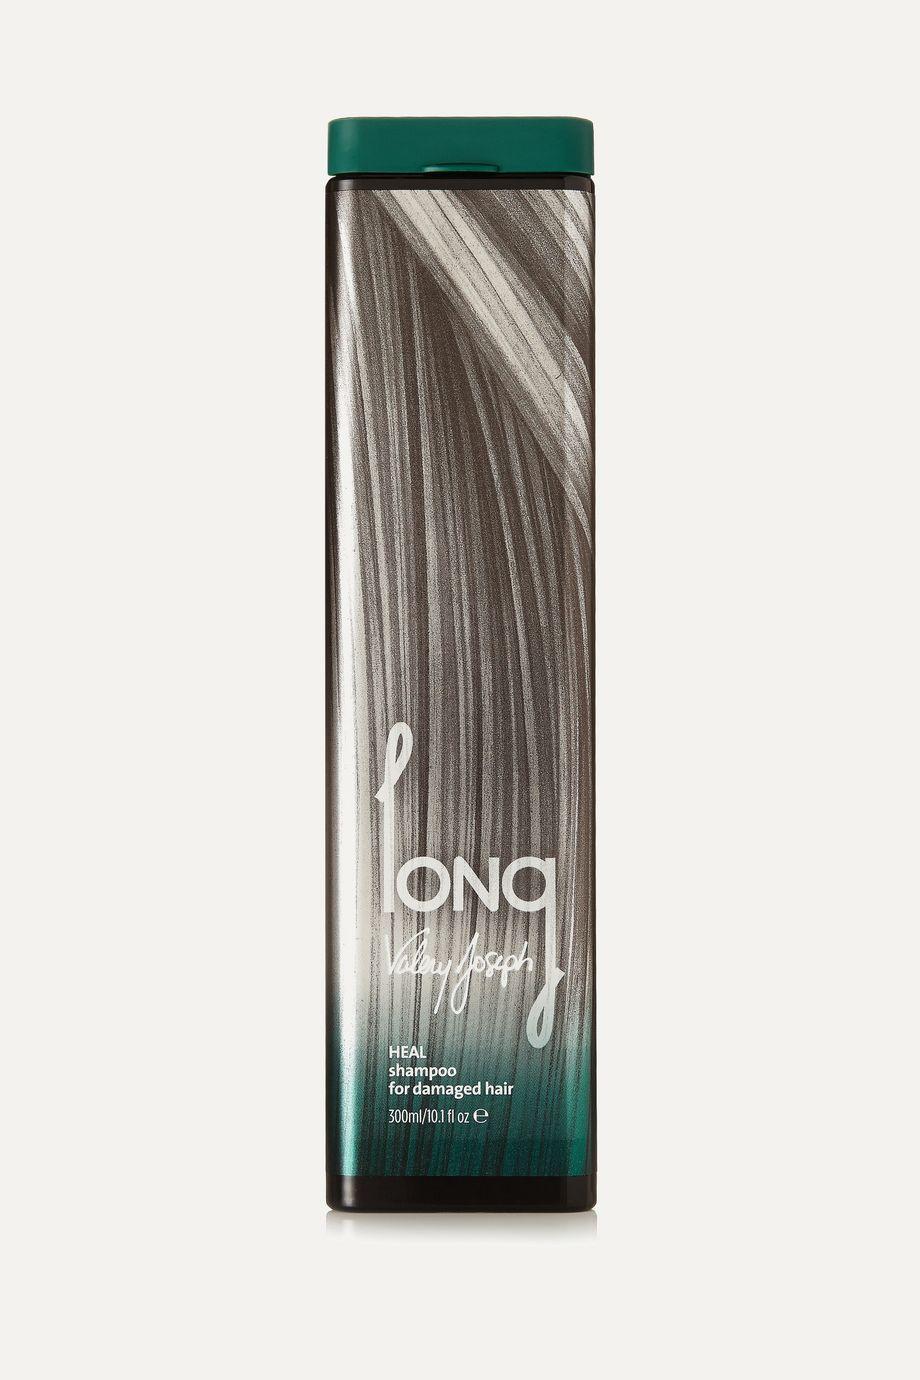 Long by Valery Joseph Heal Shampoo for Damaged Hair, 300 ml – Shampoo